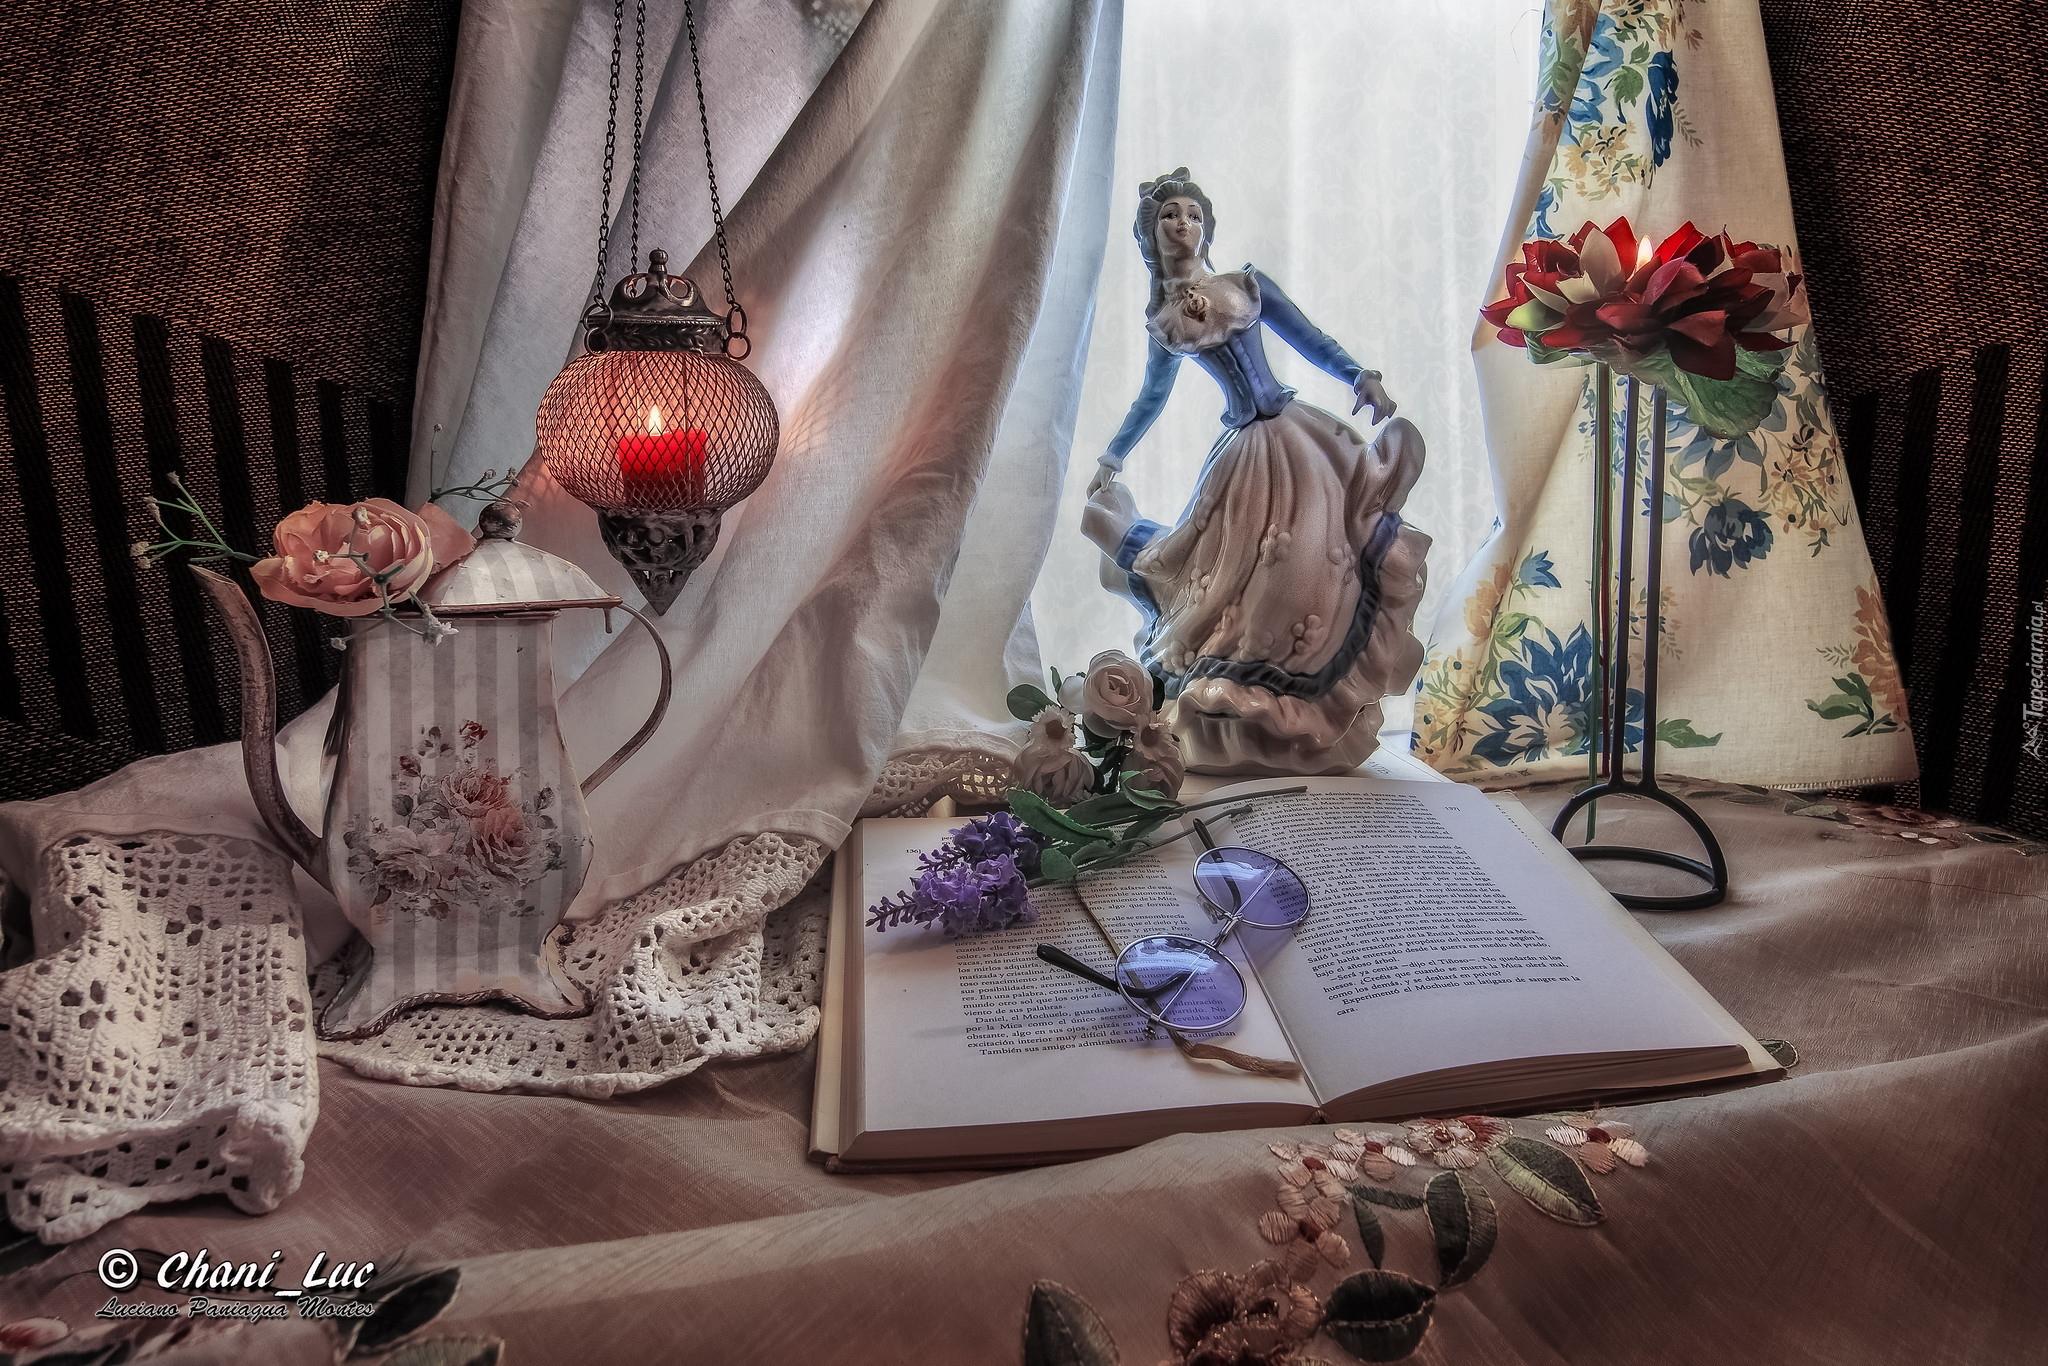 tapeta-porcelanowa-figurka-obok-ksiazki-i-dzbanka.jpg